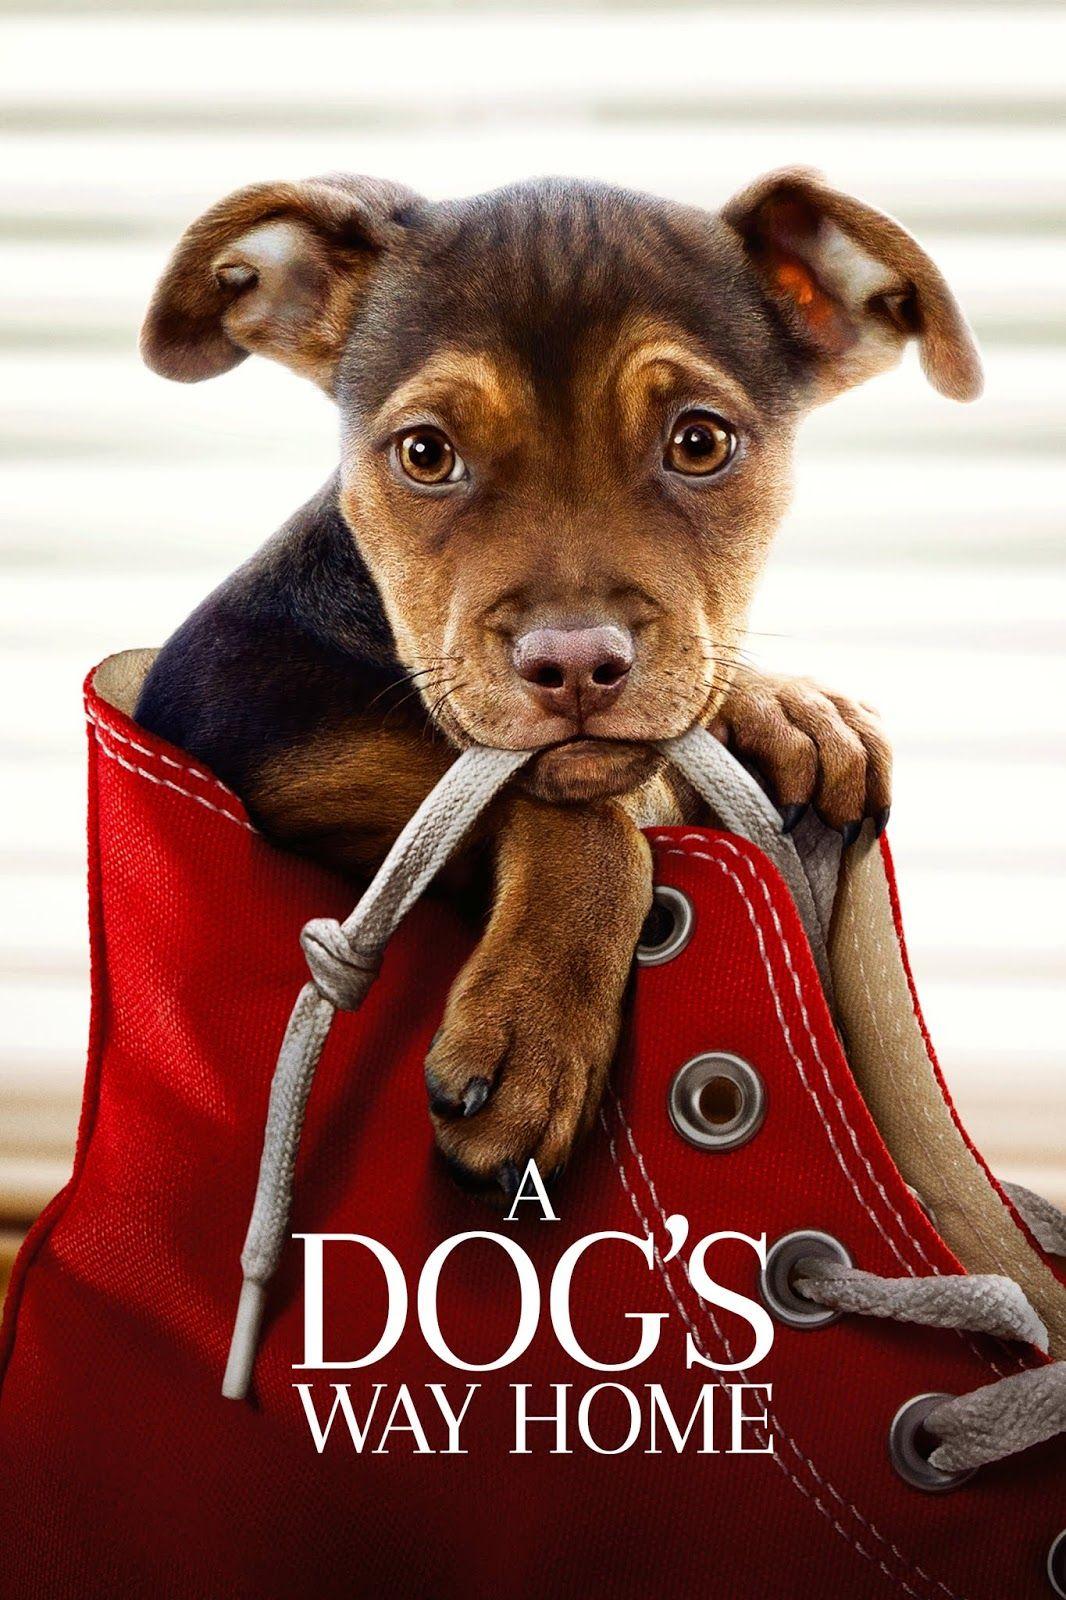 Playtamildub A Dogs Way Home 2019 Movie Tamil Dubbed Hd Full